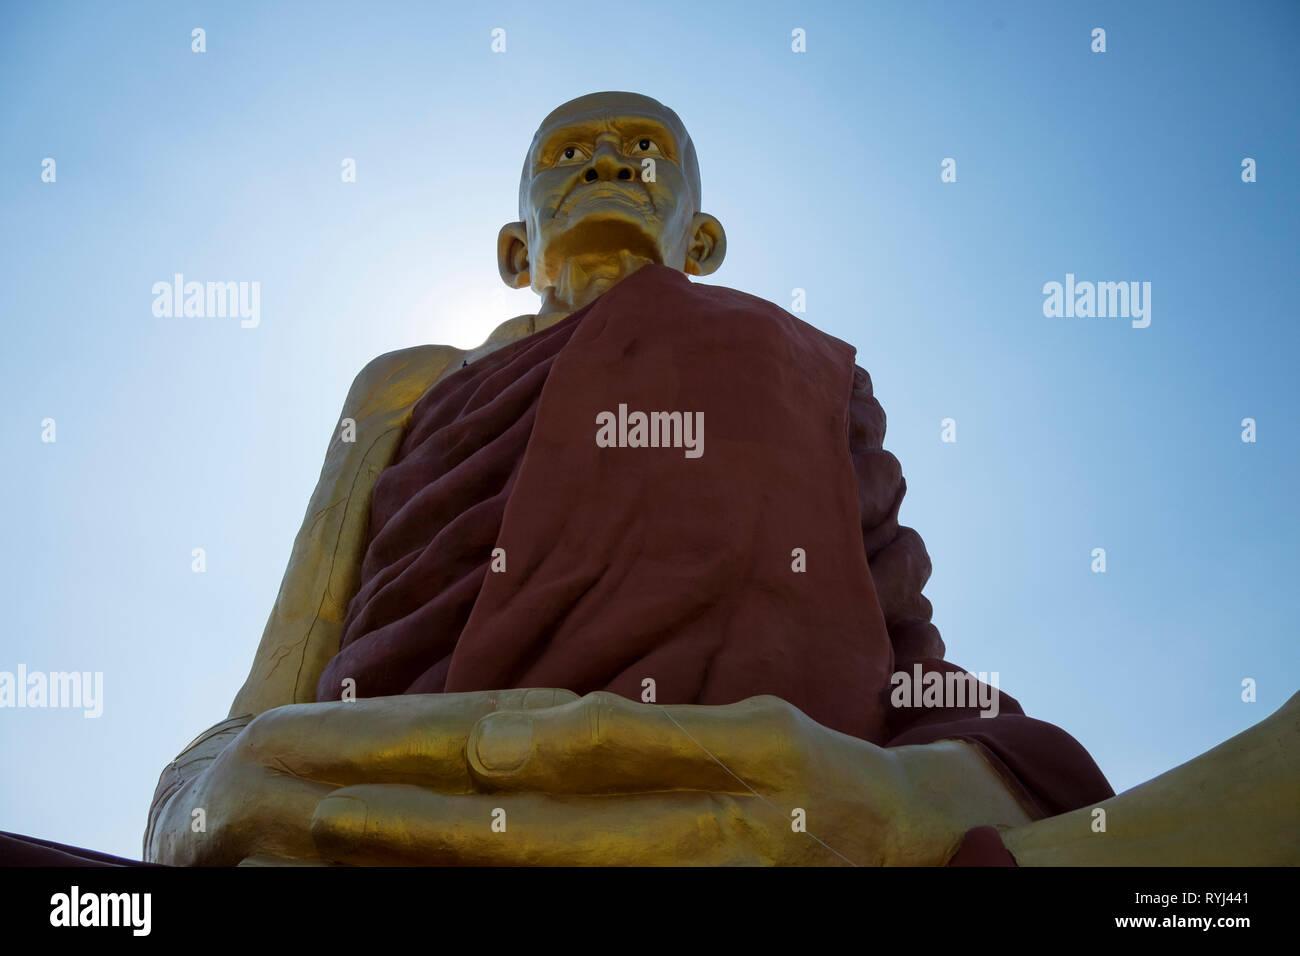 Mun Bhuridatta, a revered monk, looms over the landscape in Khon Kaen, Thailand. - Stock Image